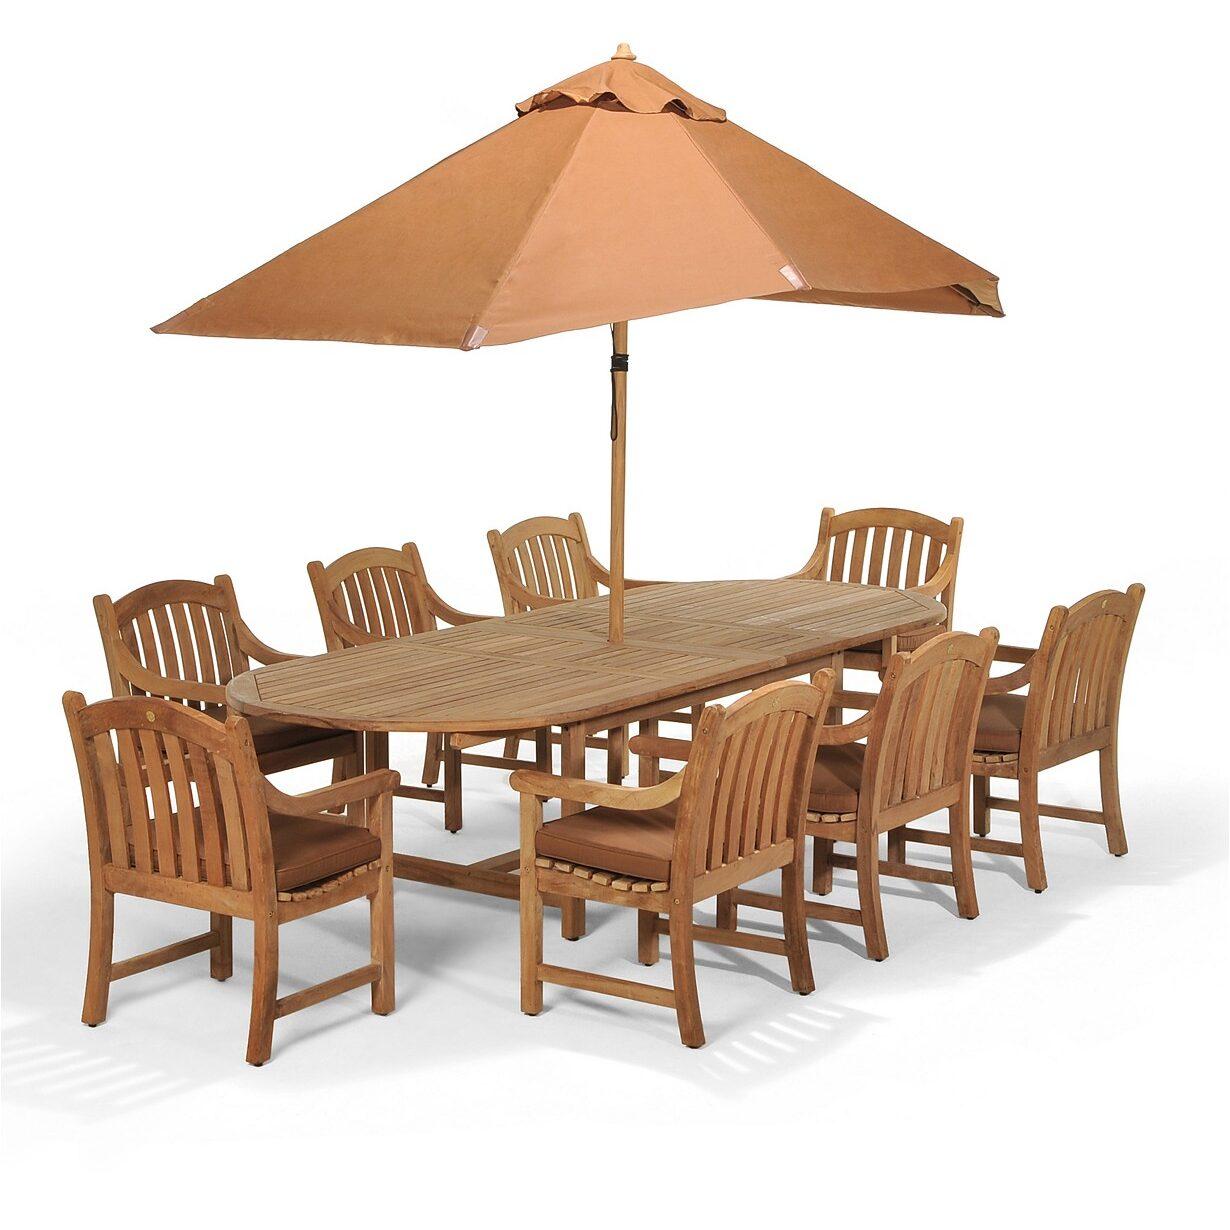 Bristol Outdoor Teak 9-Pc. Dining Set $2,529 w/ Free Shipping (Was $6919)